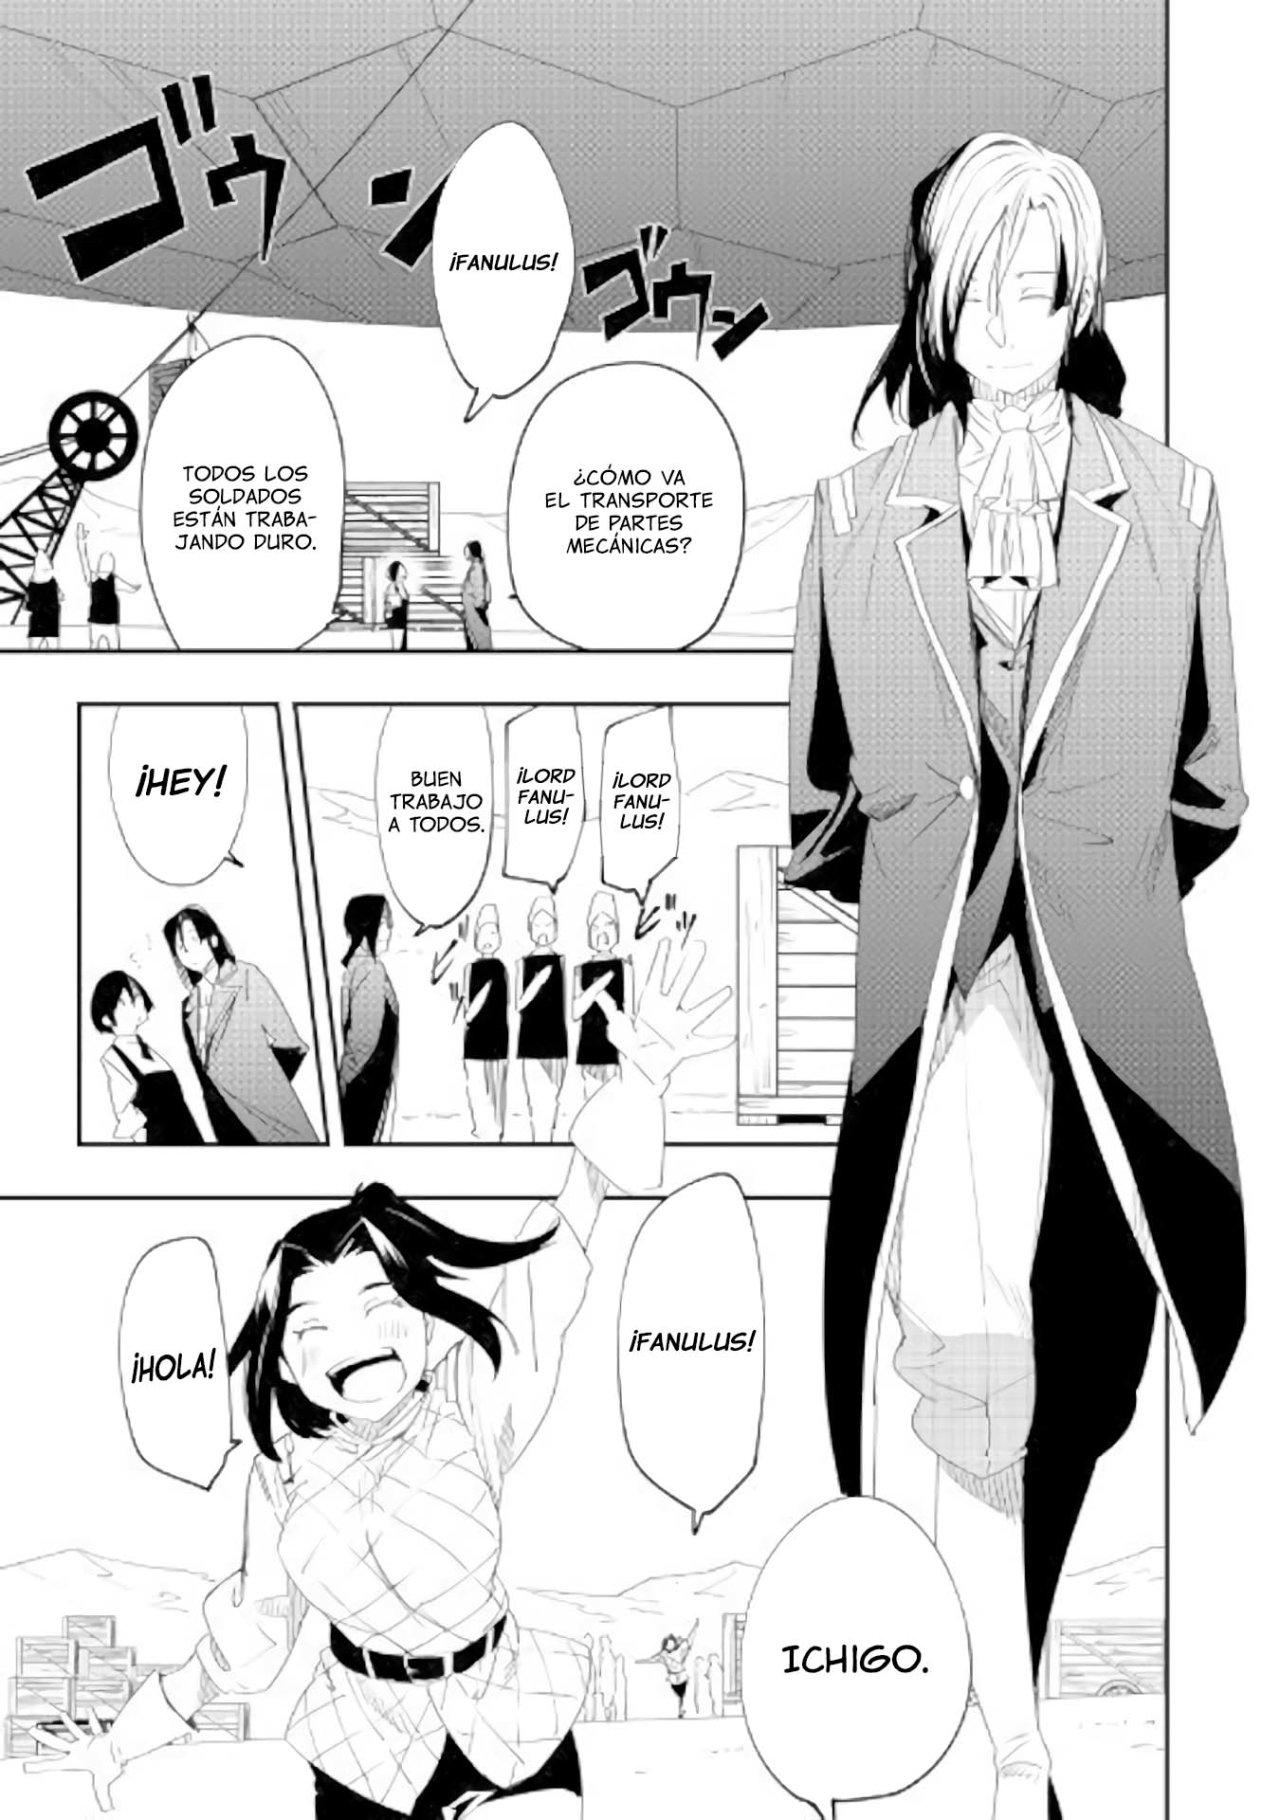 https://nine.mangadogs.com/es_manga/pic8/55/21175/947548/b5daaa1a65fab780763c6dc7df93d38b.jpg Page 10